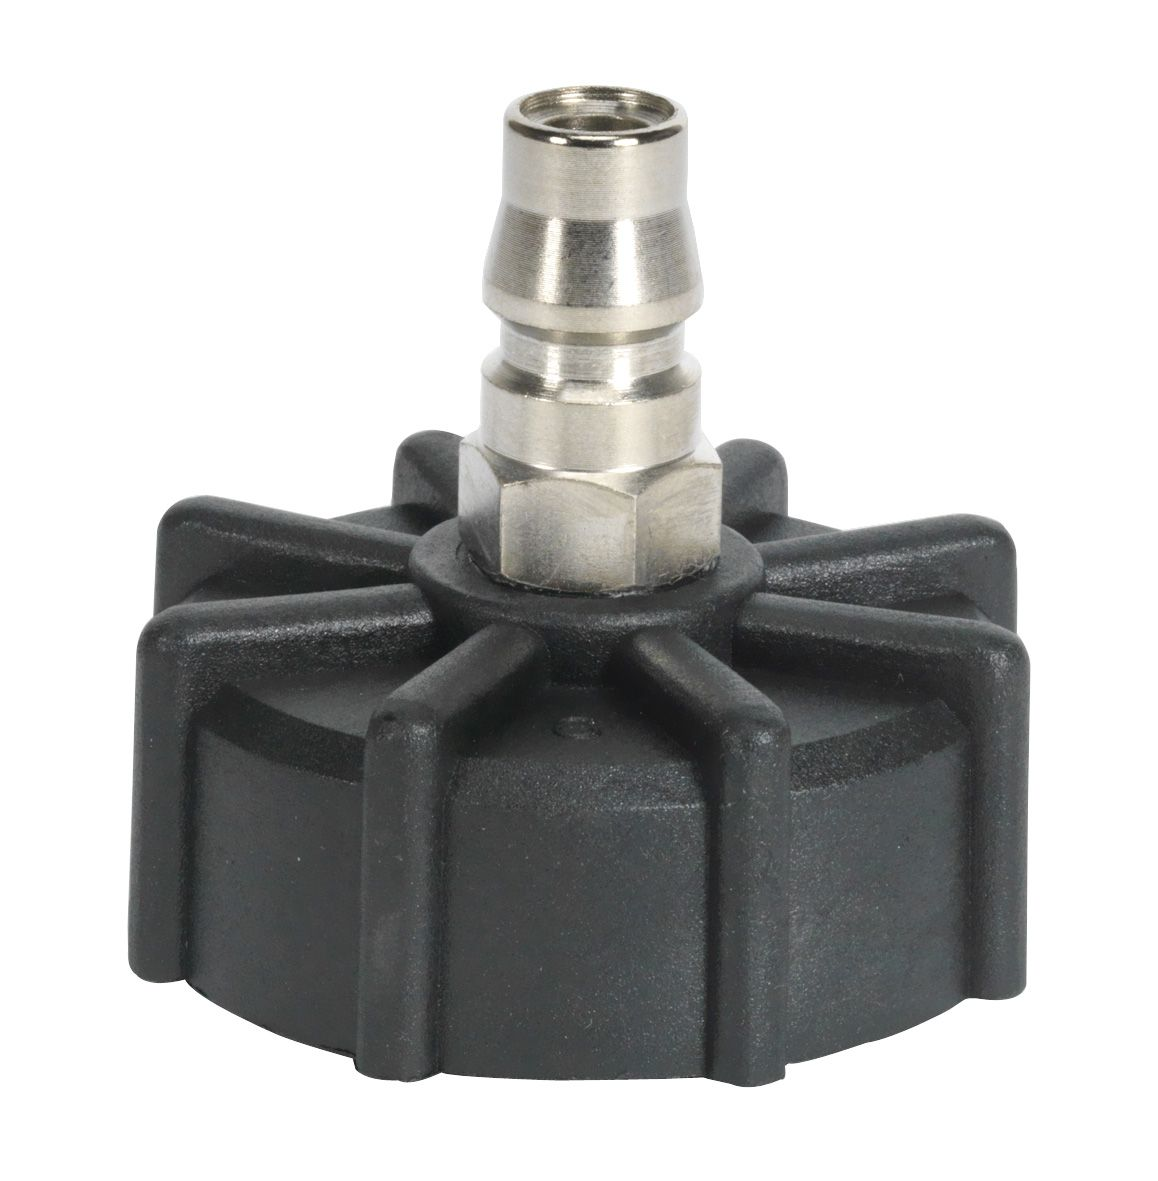 Sealey Brake Reservoir Cap 45mm - Straight Connector for VS820